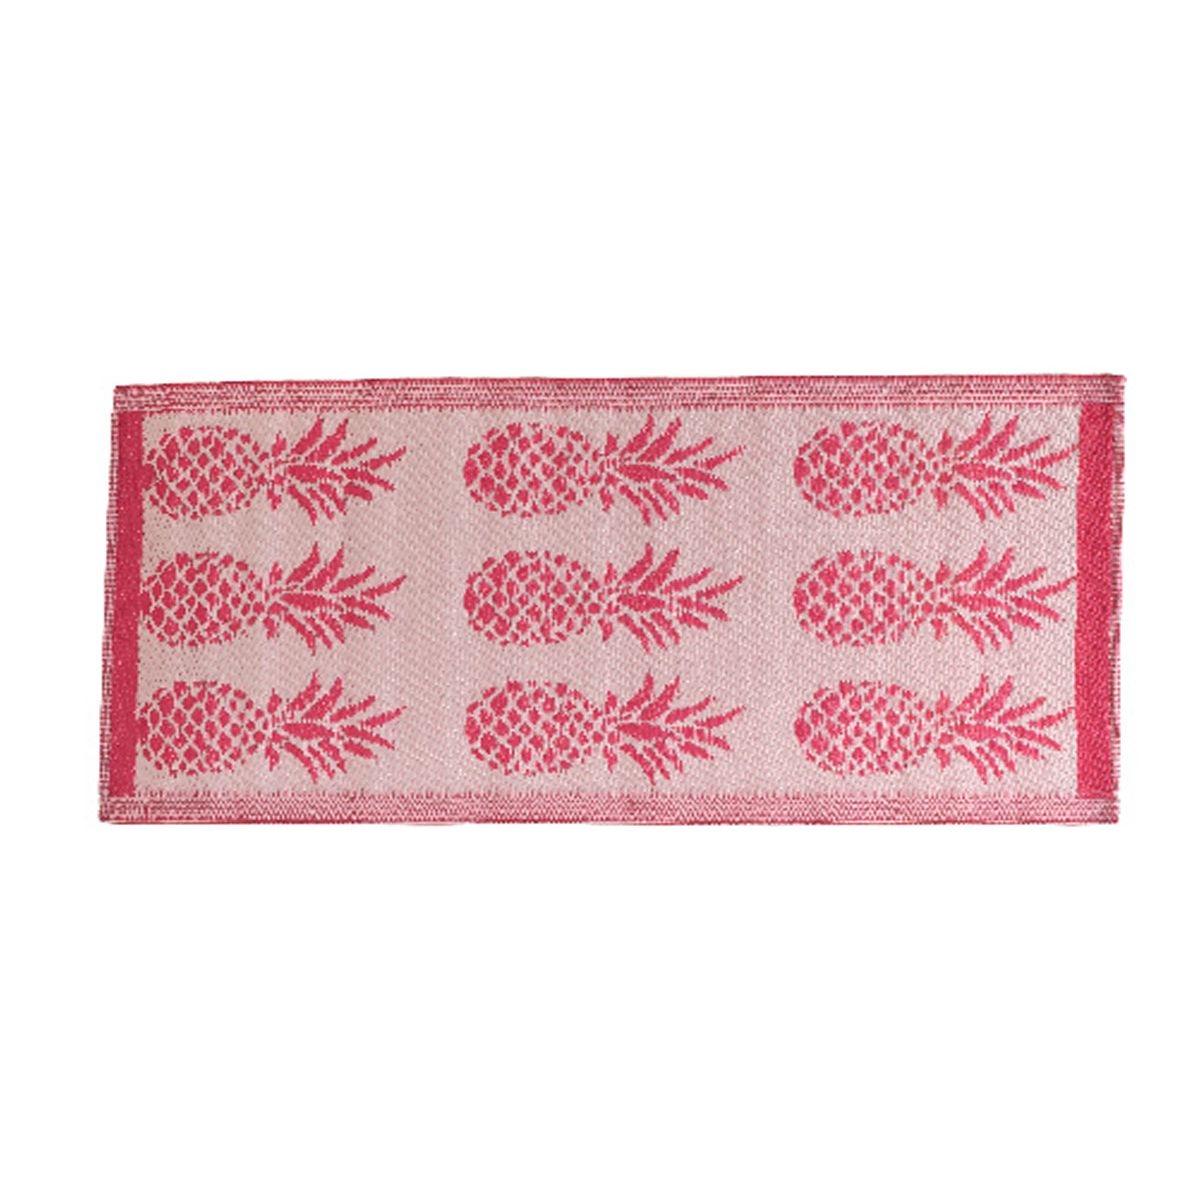 Tapis rectangulaire en polypropylène 140 x 70 cm motifs ananas Rose - Jardideco